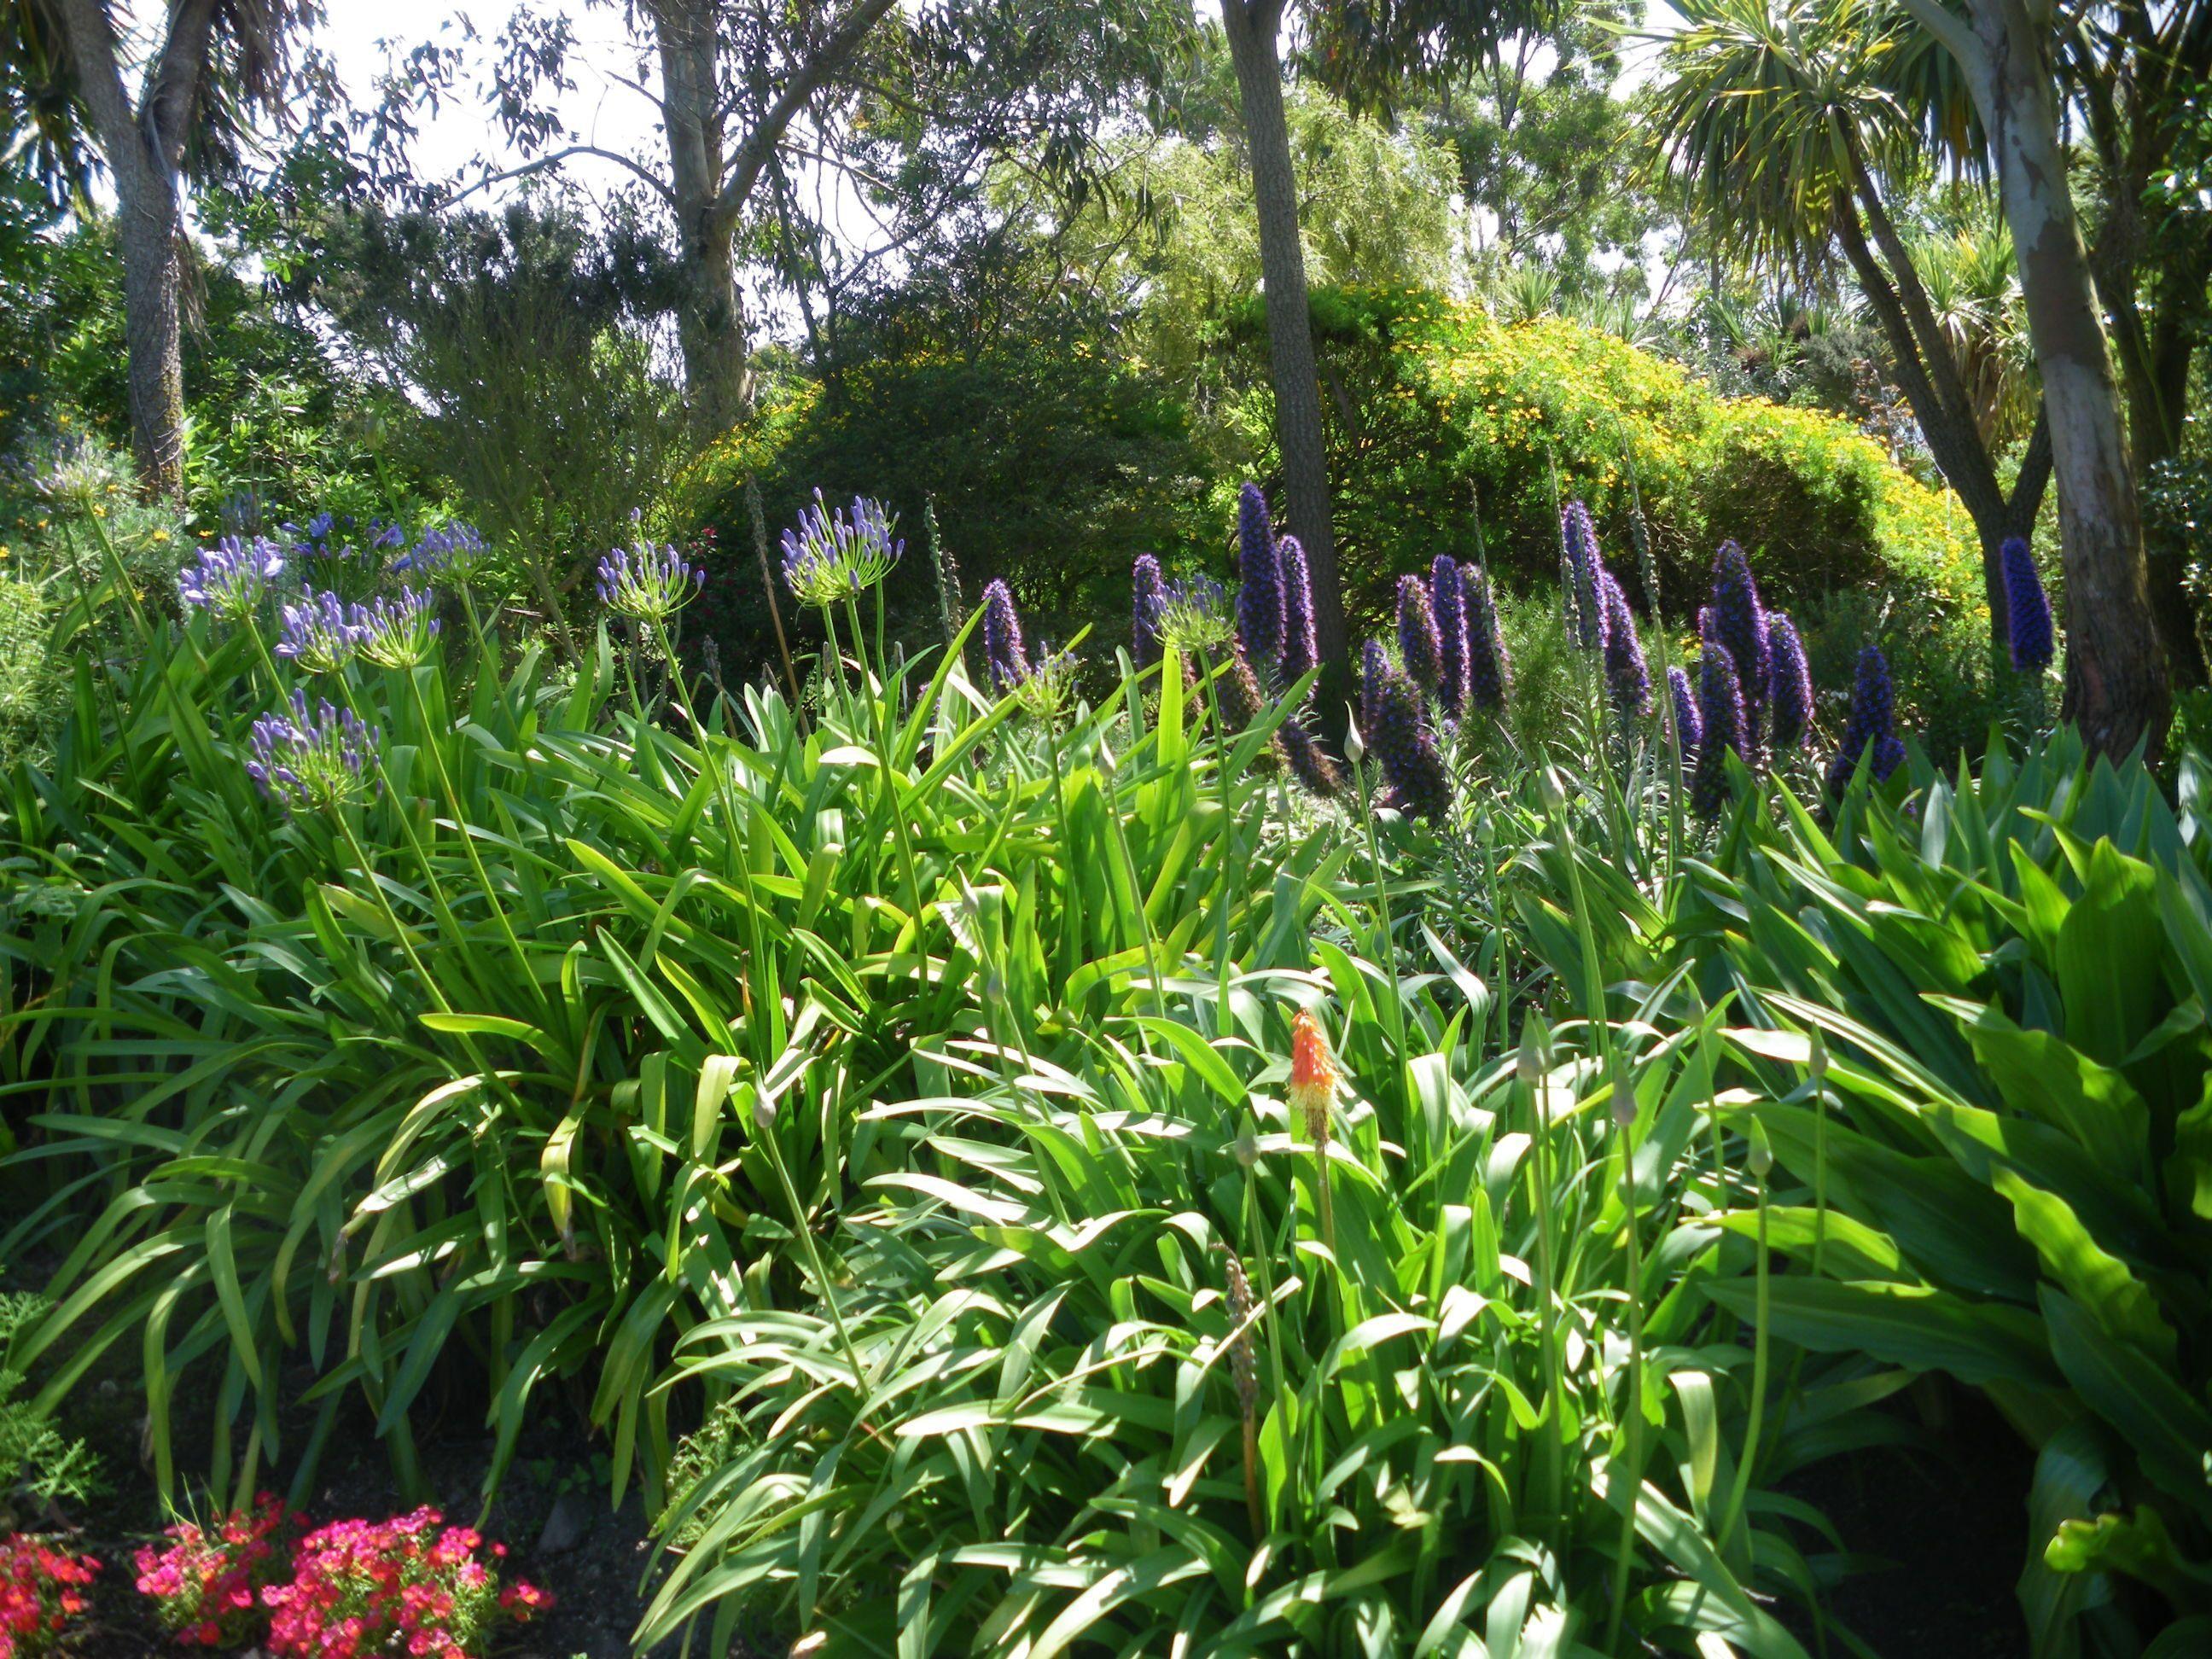 mes photos jardin exotique a roscoff - Page 6